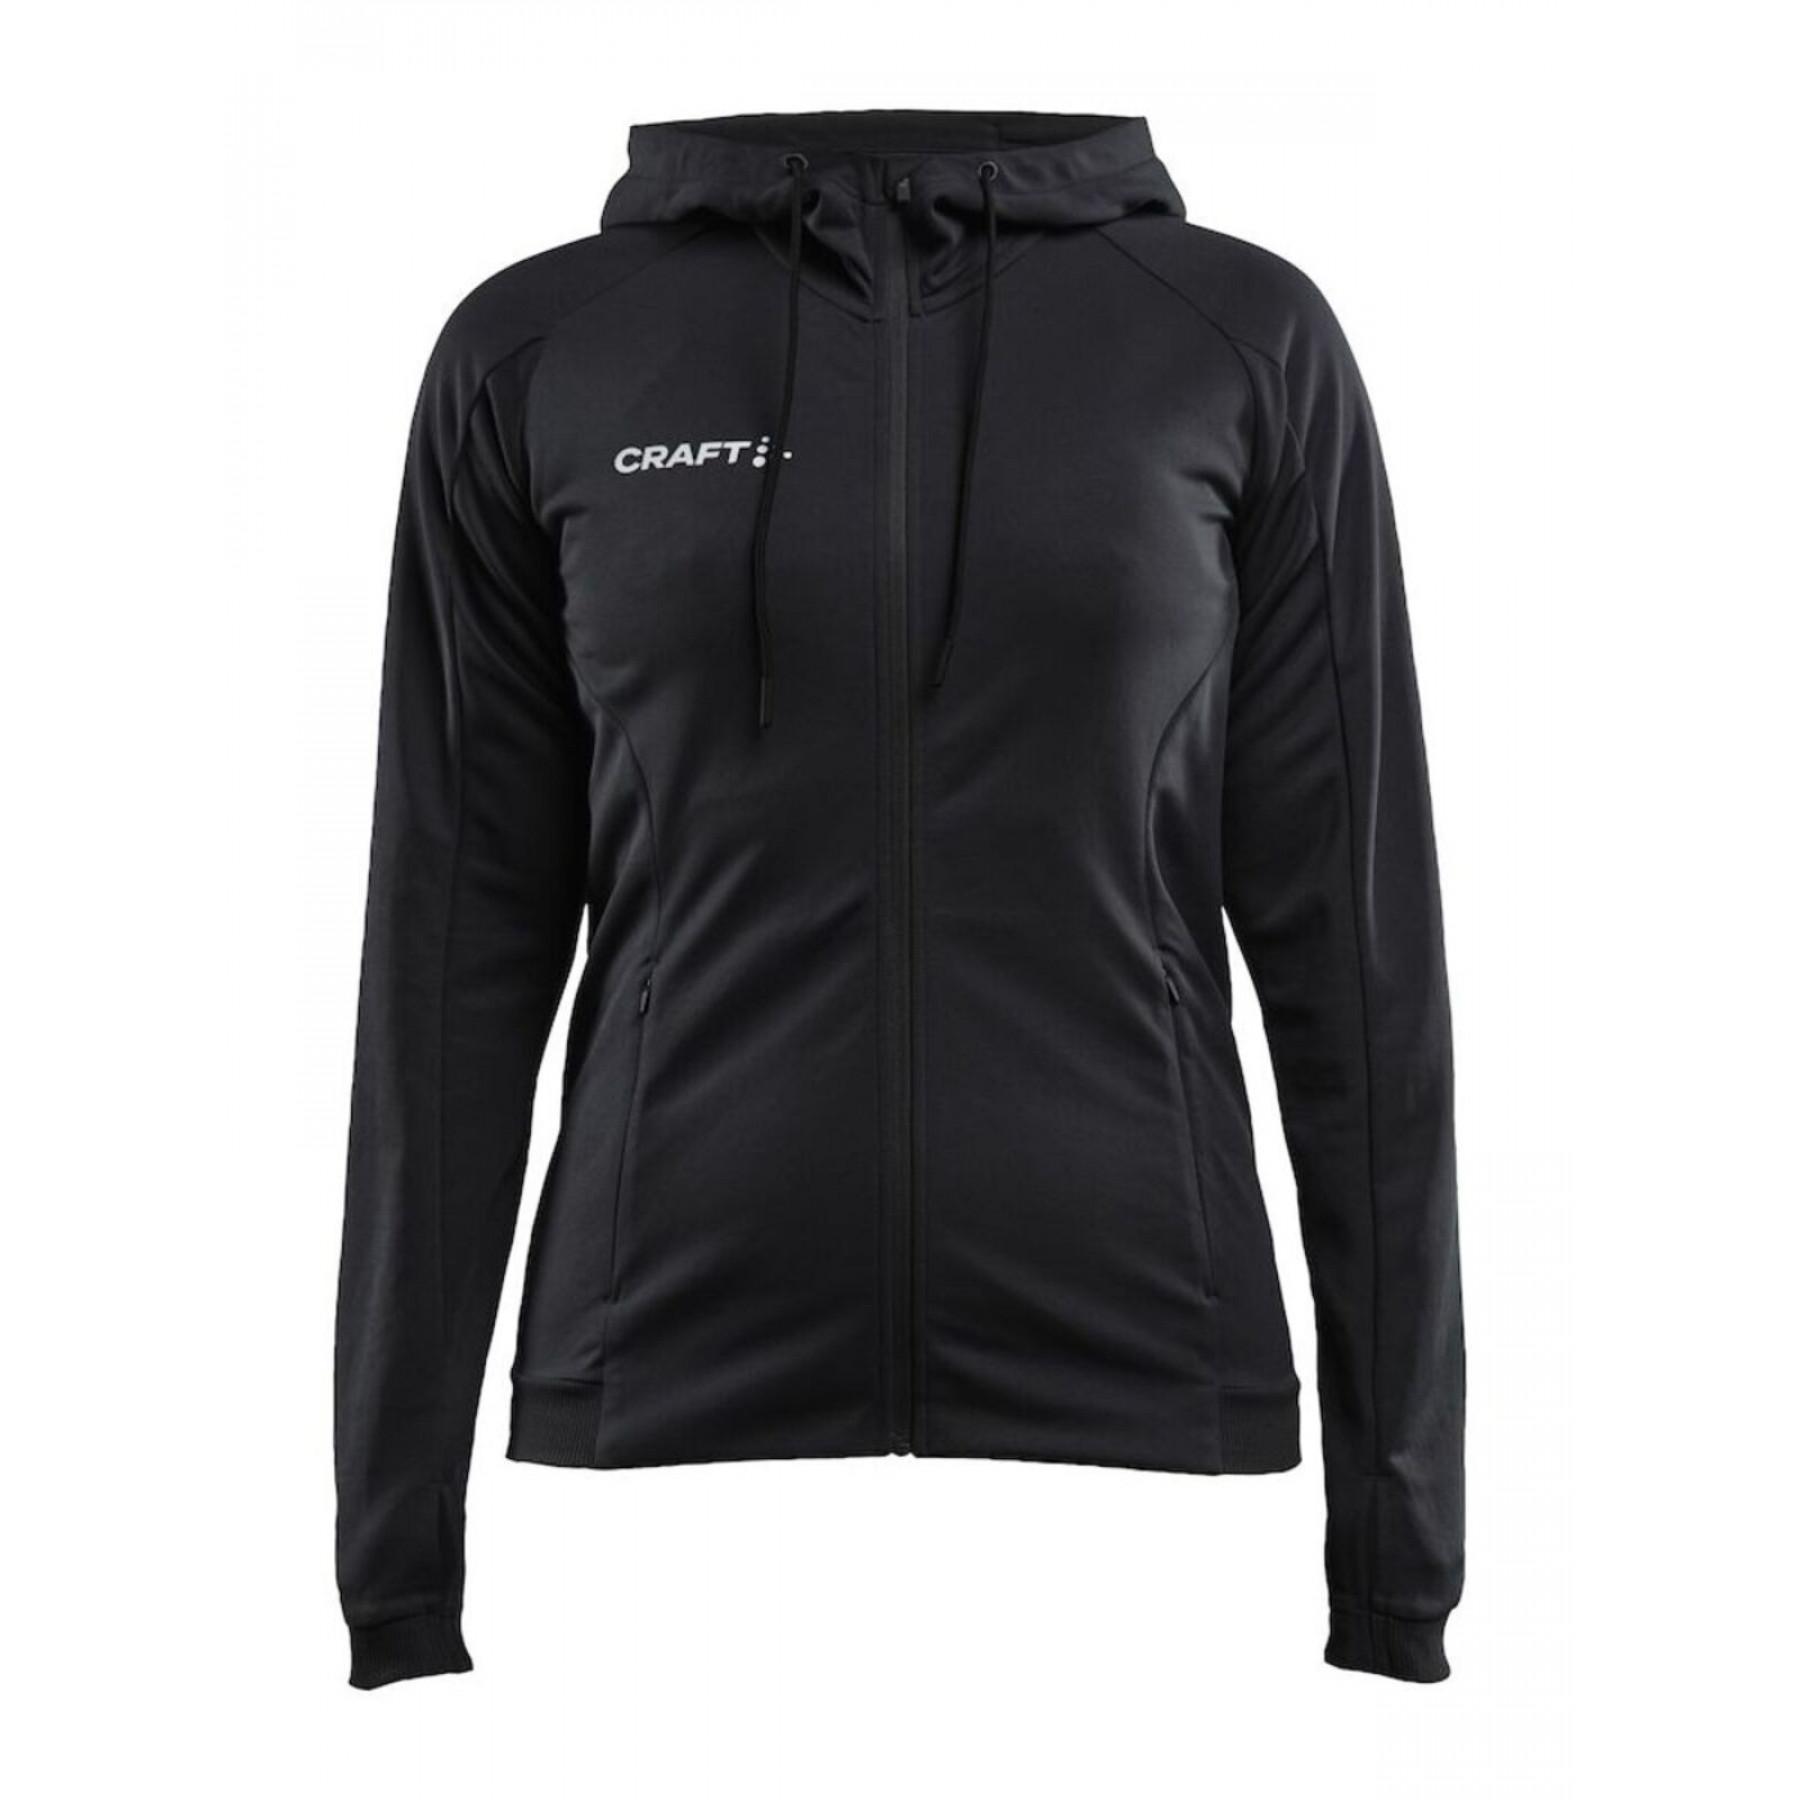 Jacket woman Craft core soul full zip